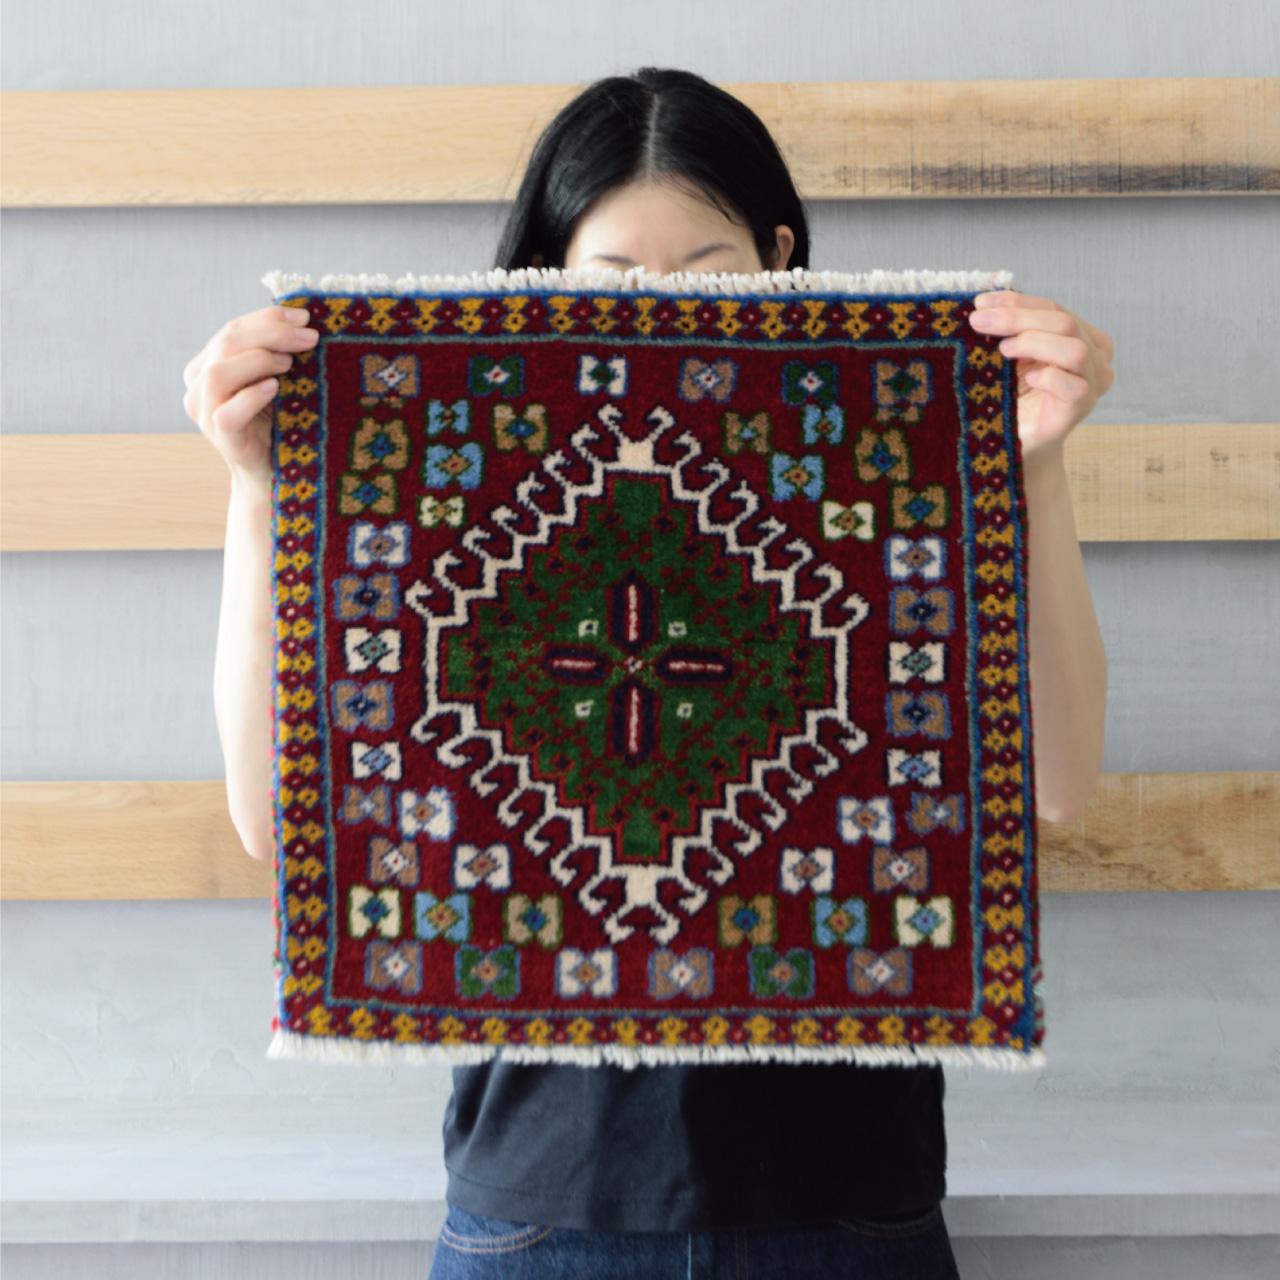 Tribal rug #71176 / 40×40cm / ヤラメ族 / ¥15,000-(税別)